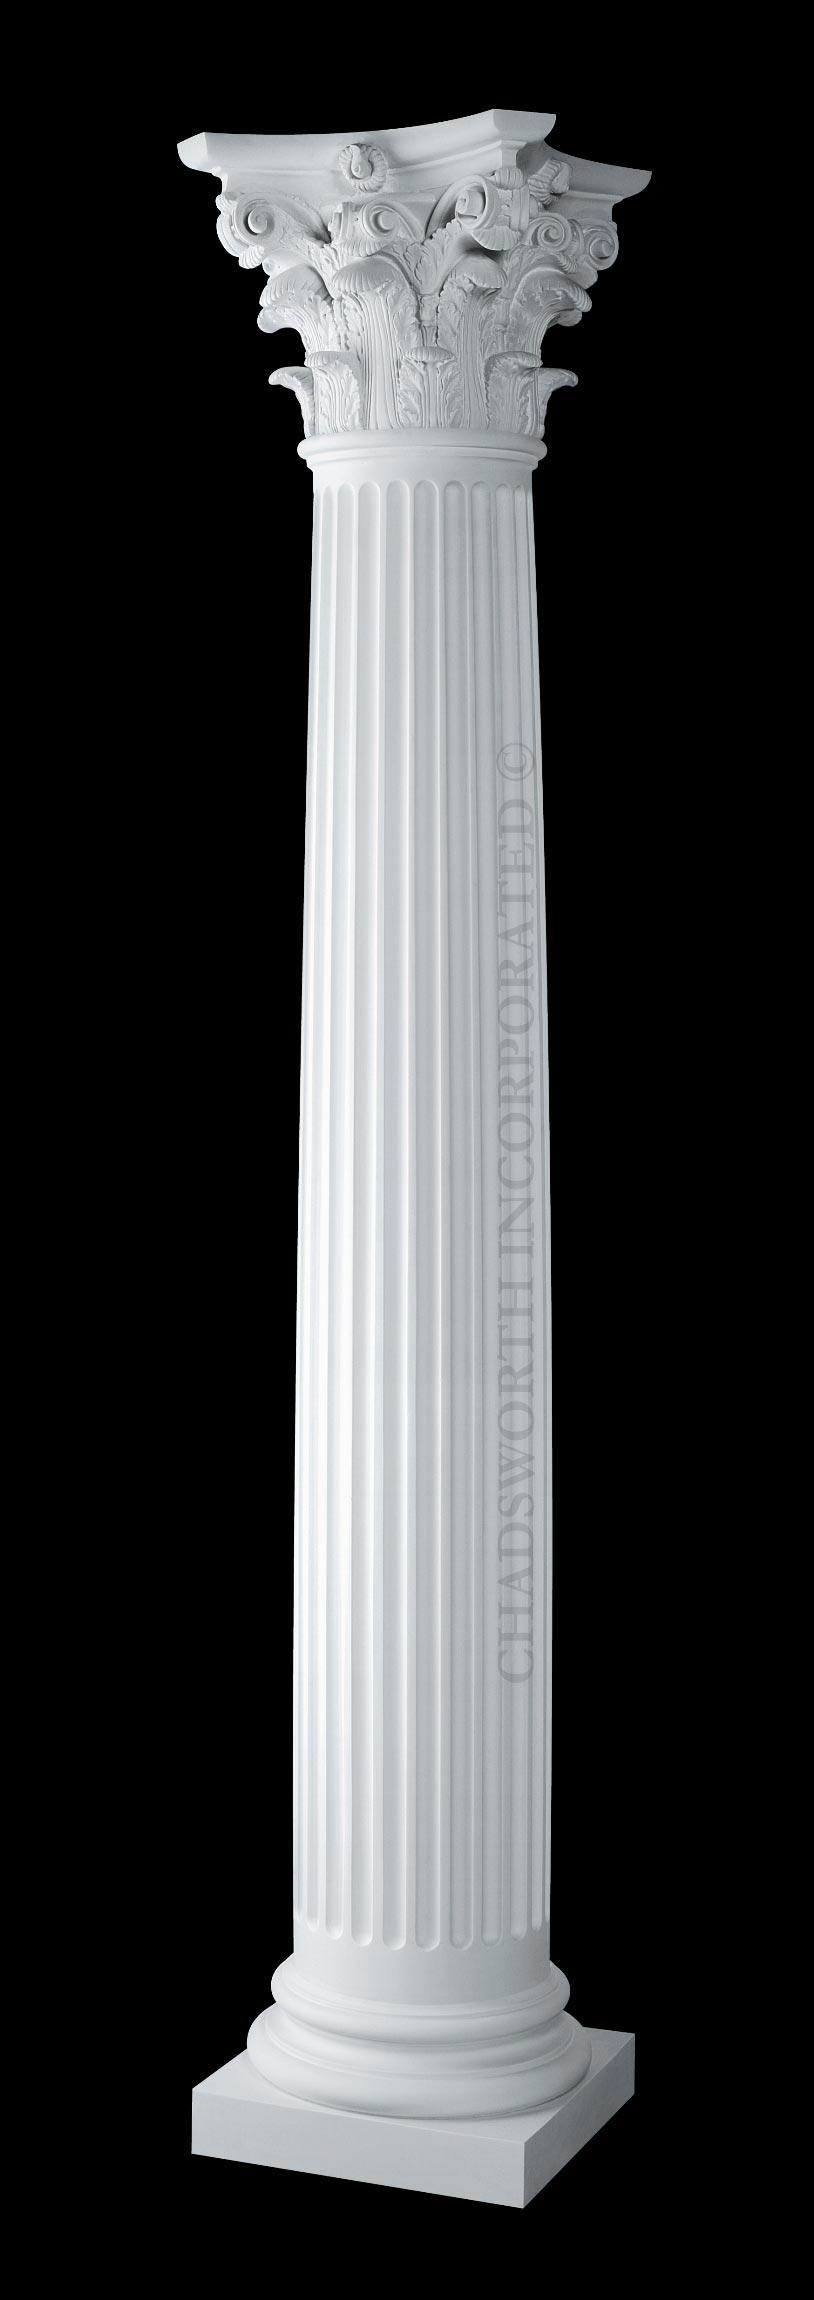 Design 635 Corinthian Order Roman Frp Composite